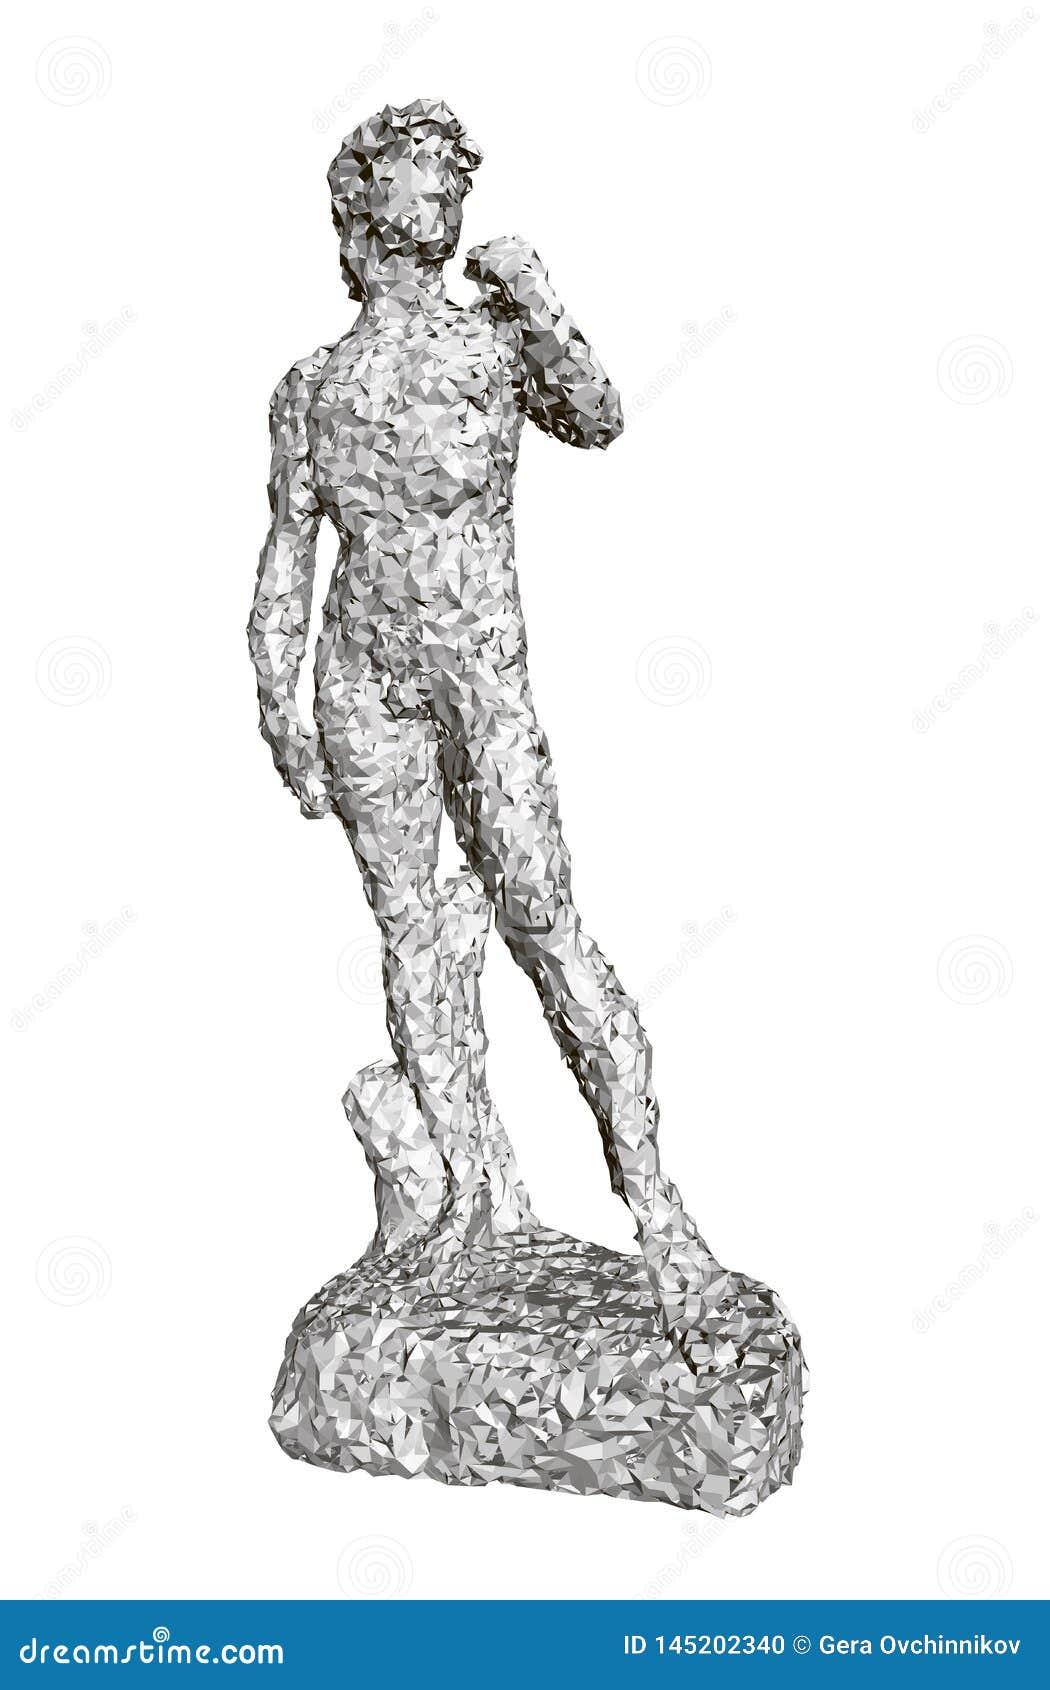 Polygonale Statue von David Front View 3d